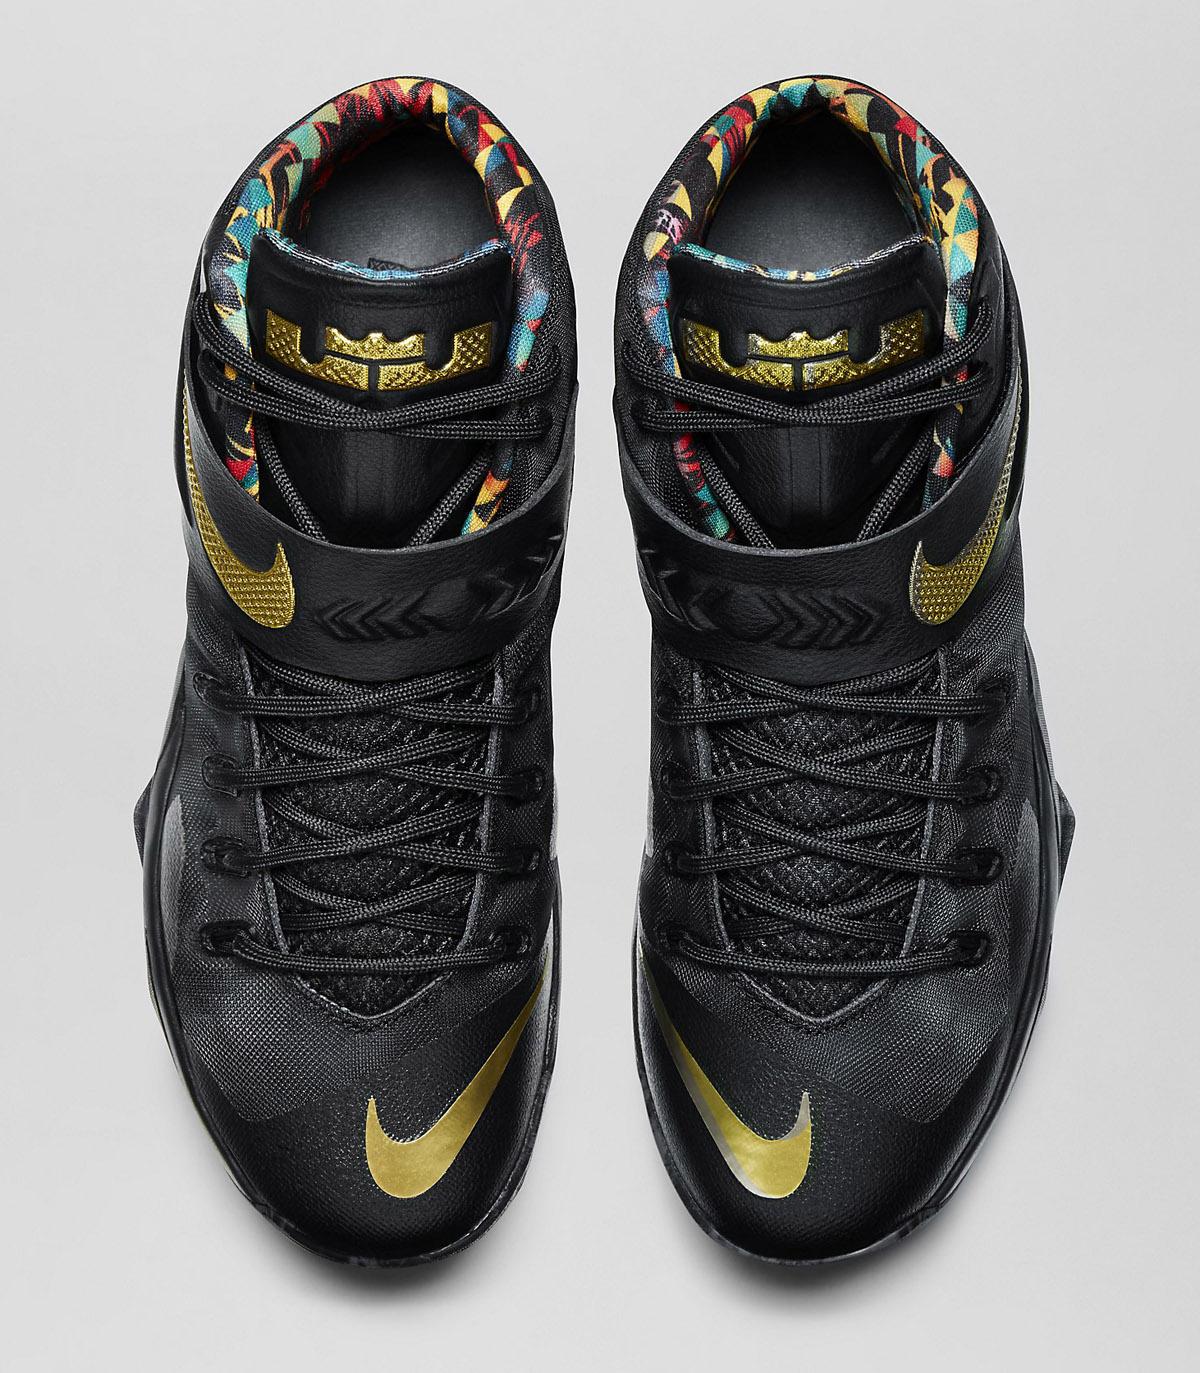 """Watch The Throne"" Nike Zoom LeBron Soldier VIII Premium"